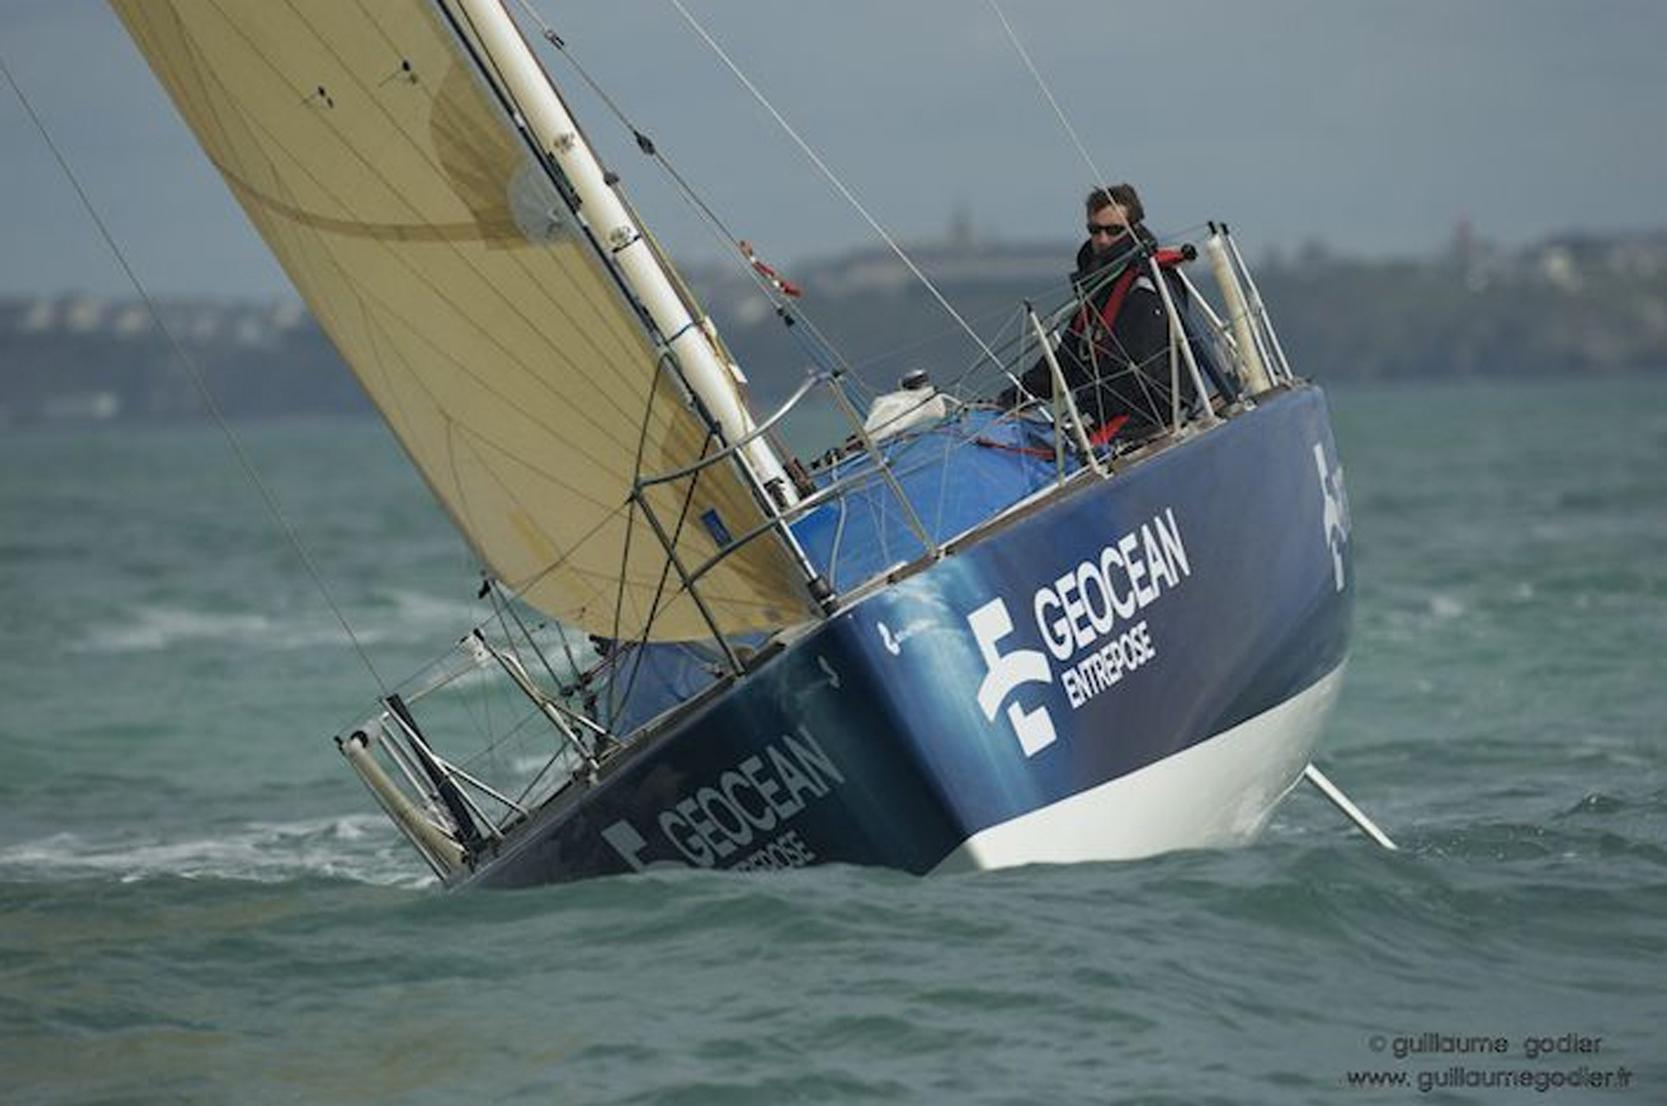 Solo Basse Normandie : Les impressions du skipper